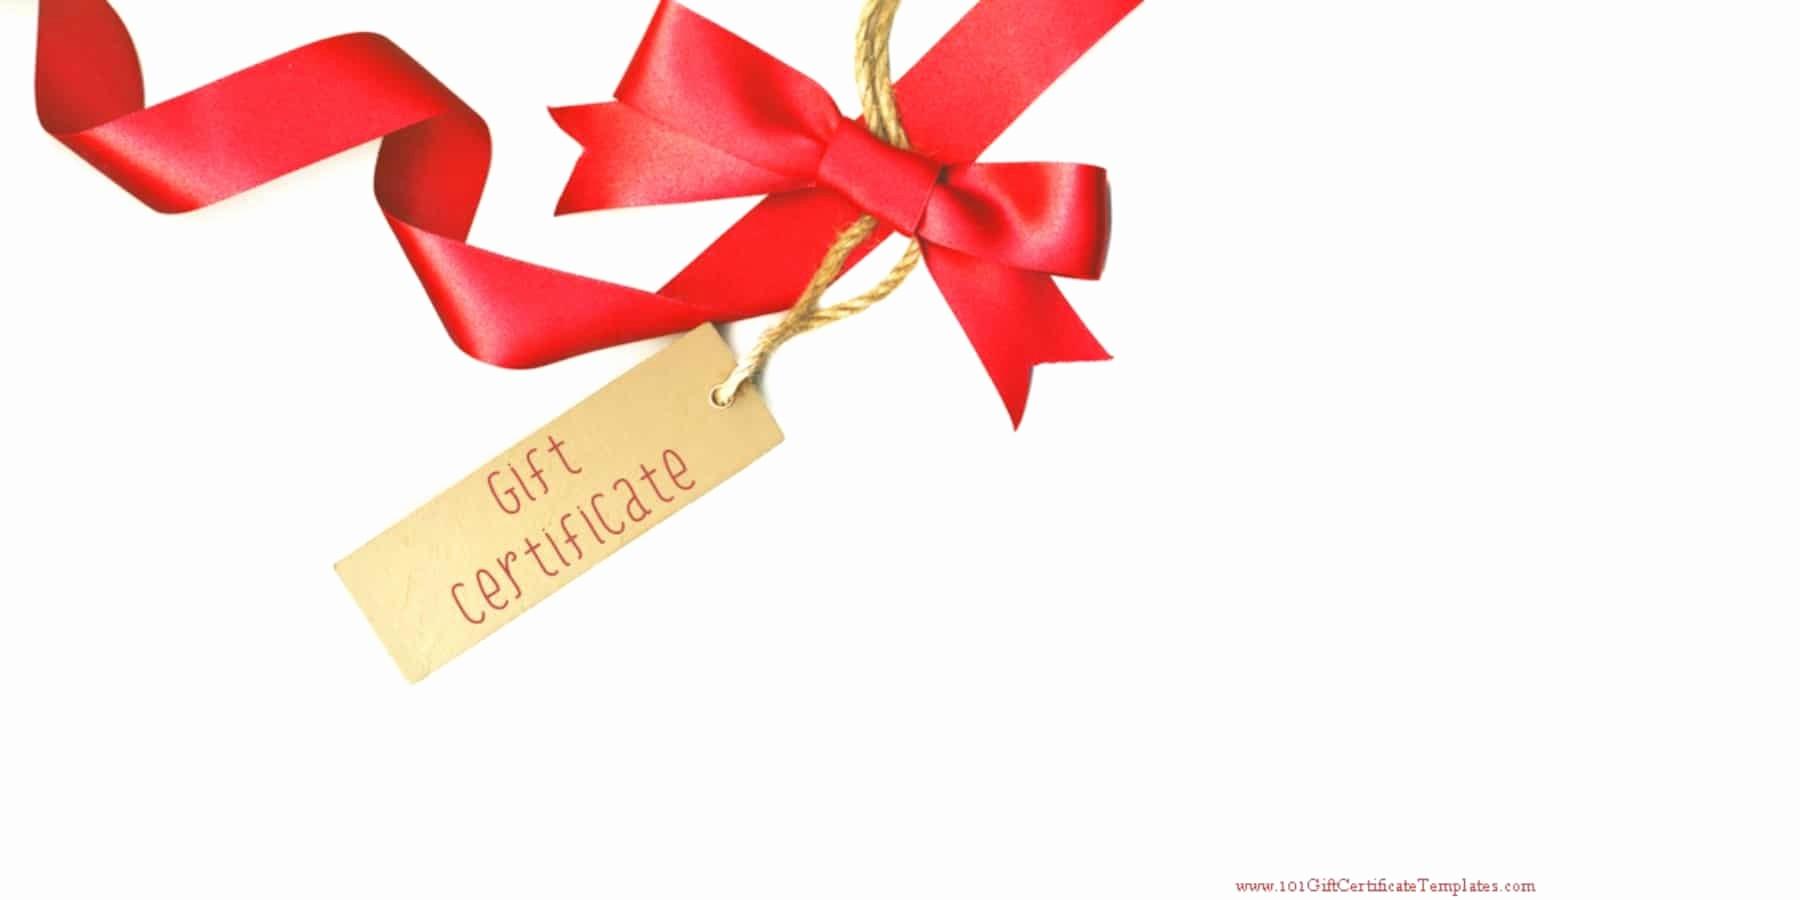 Free Printable Gift Card Template Beautiful Printable Gift Certificate Templates